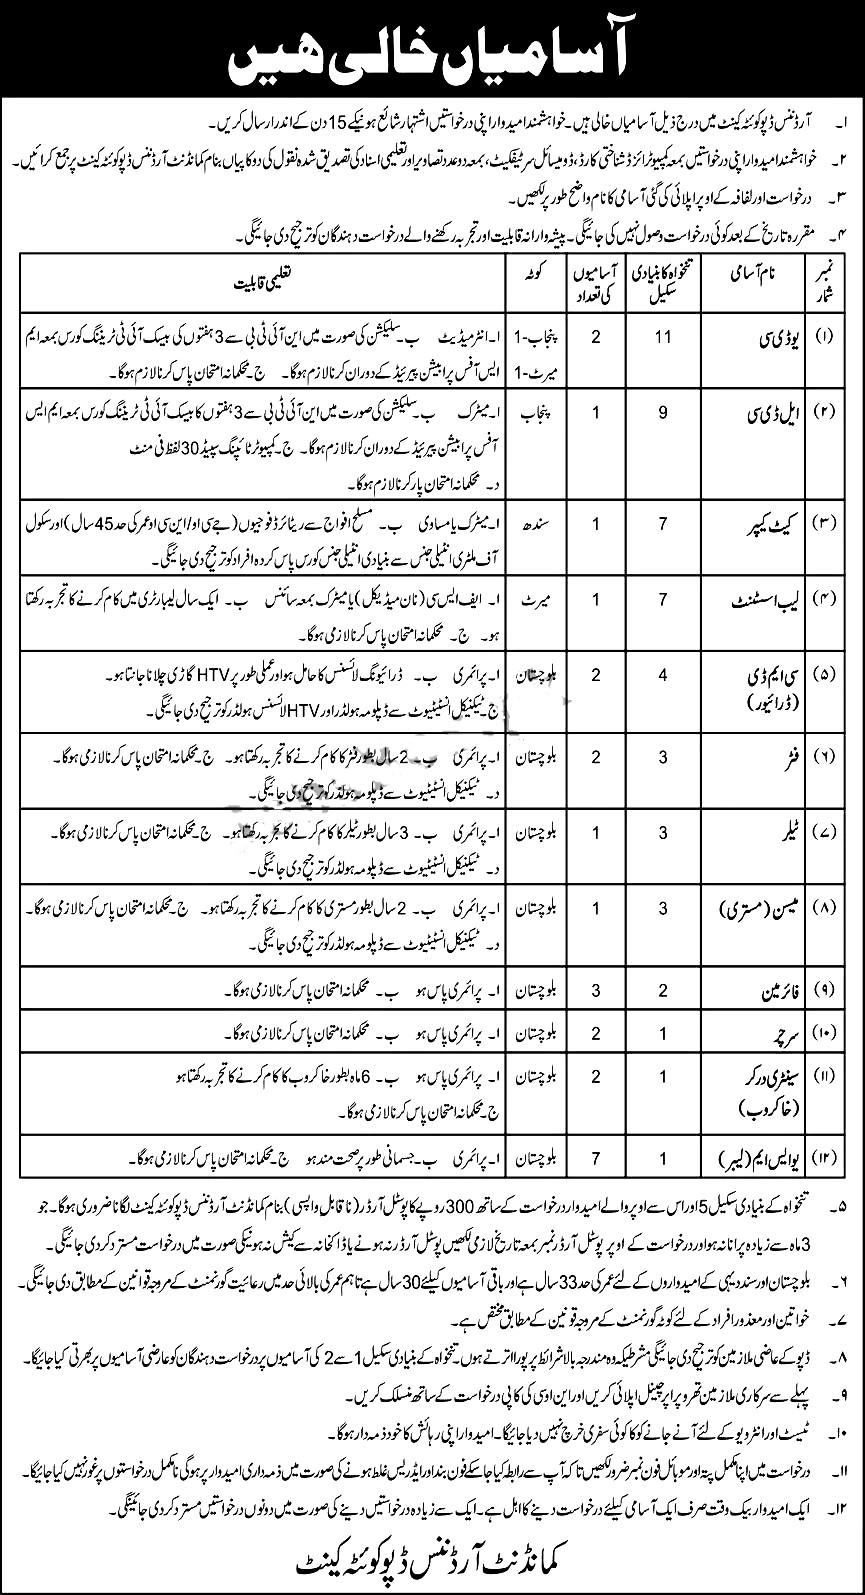 Commandant Ordnance Depot Quetta Pak Army Jobs 2021